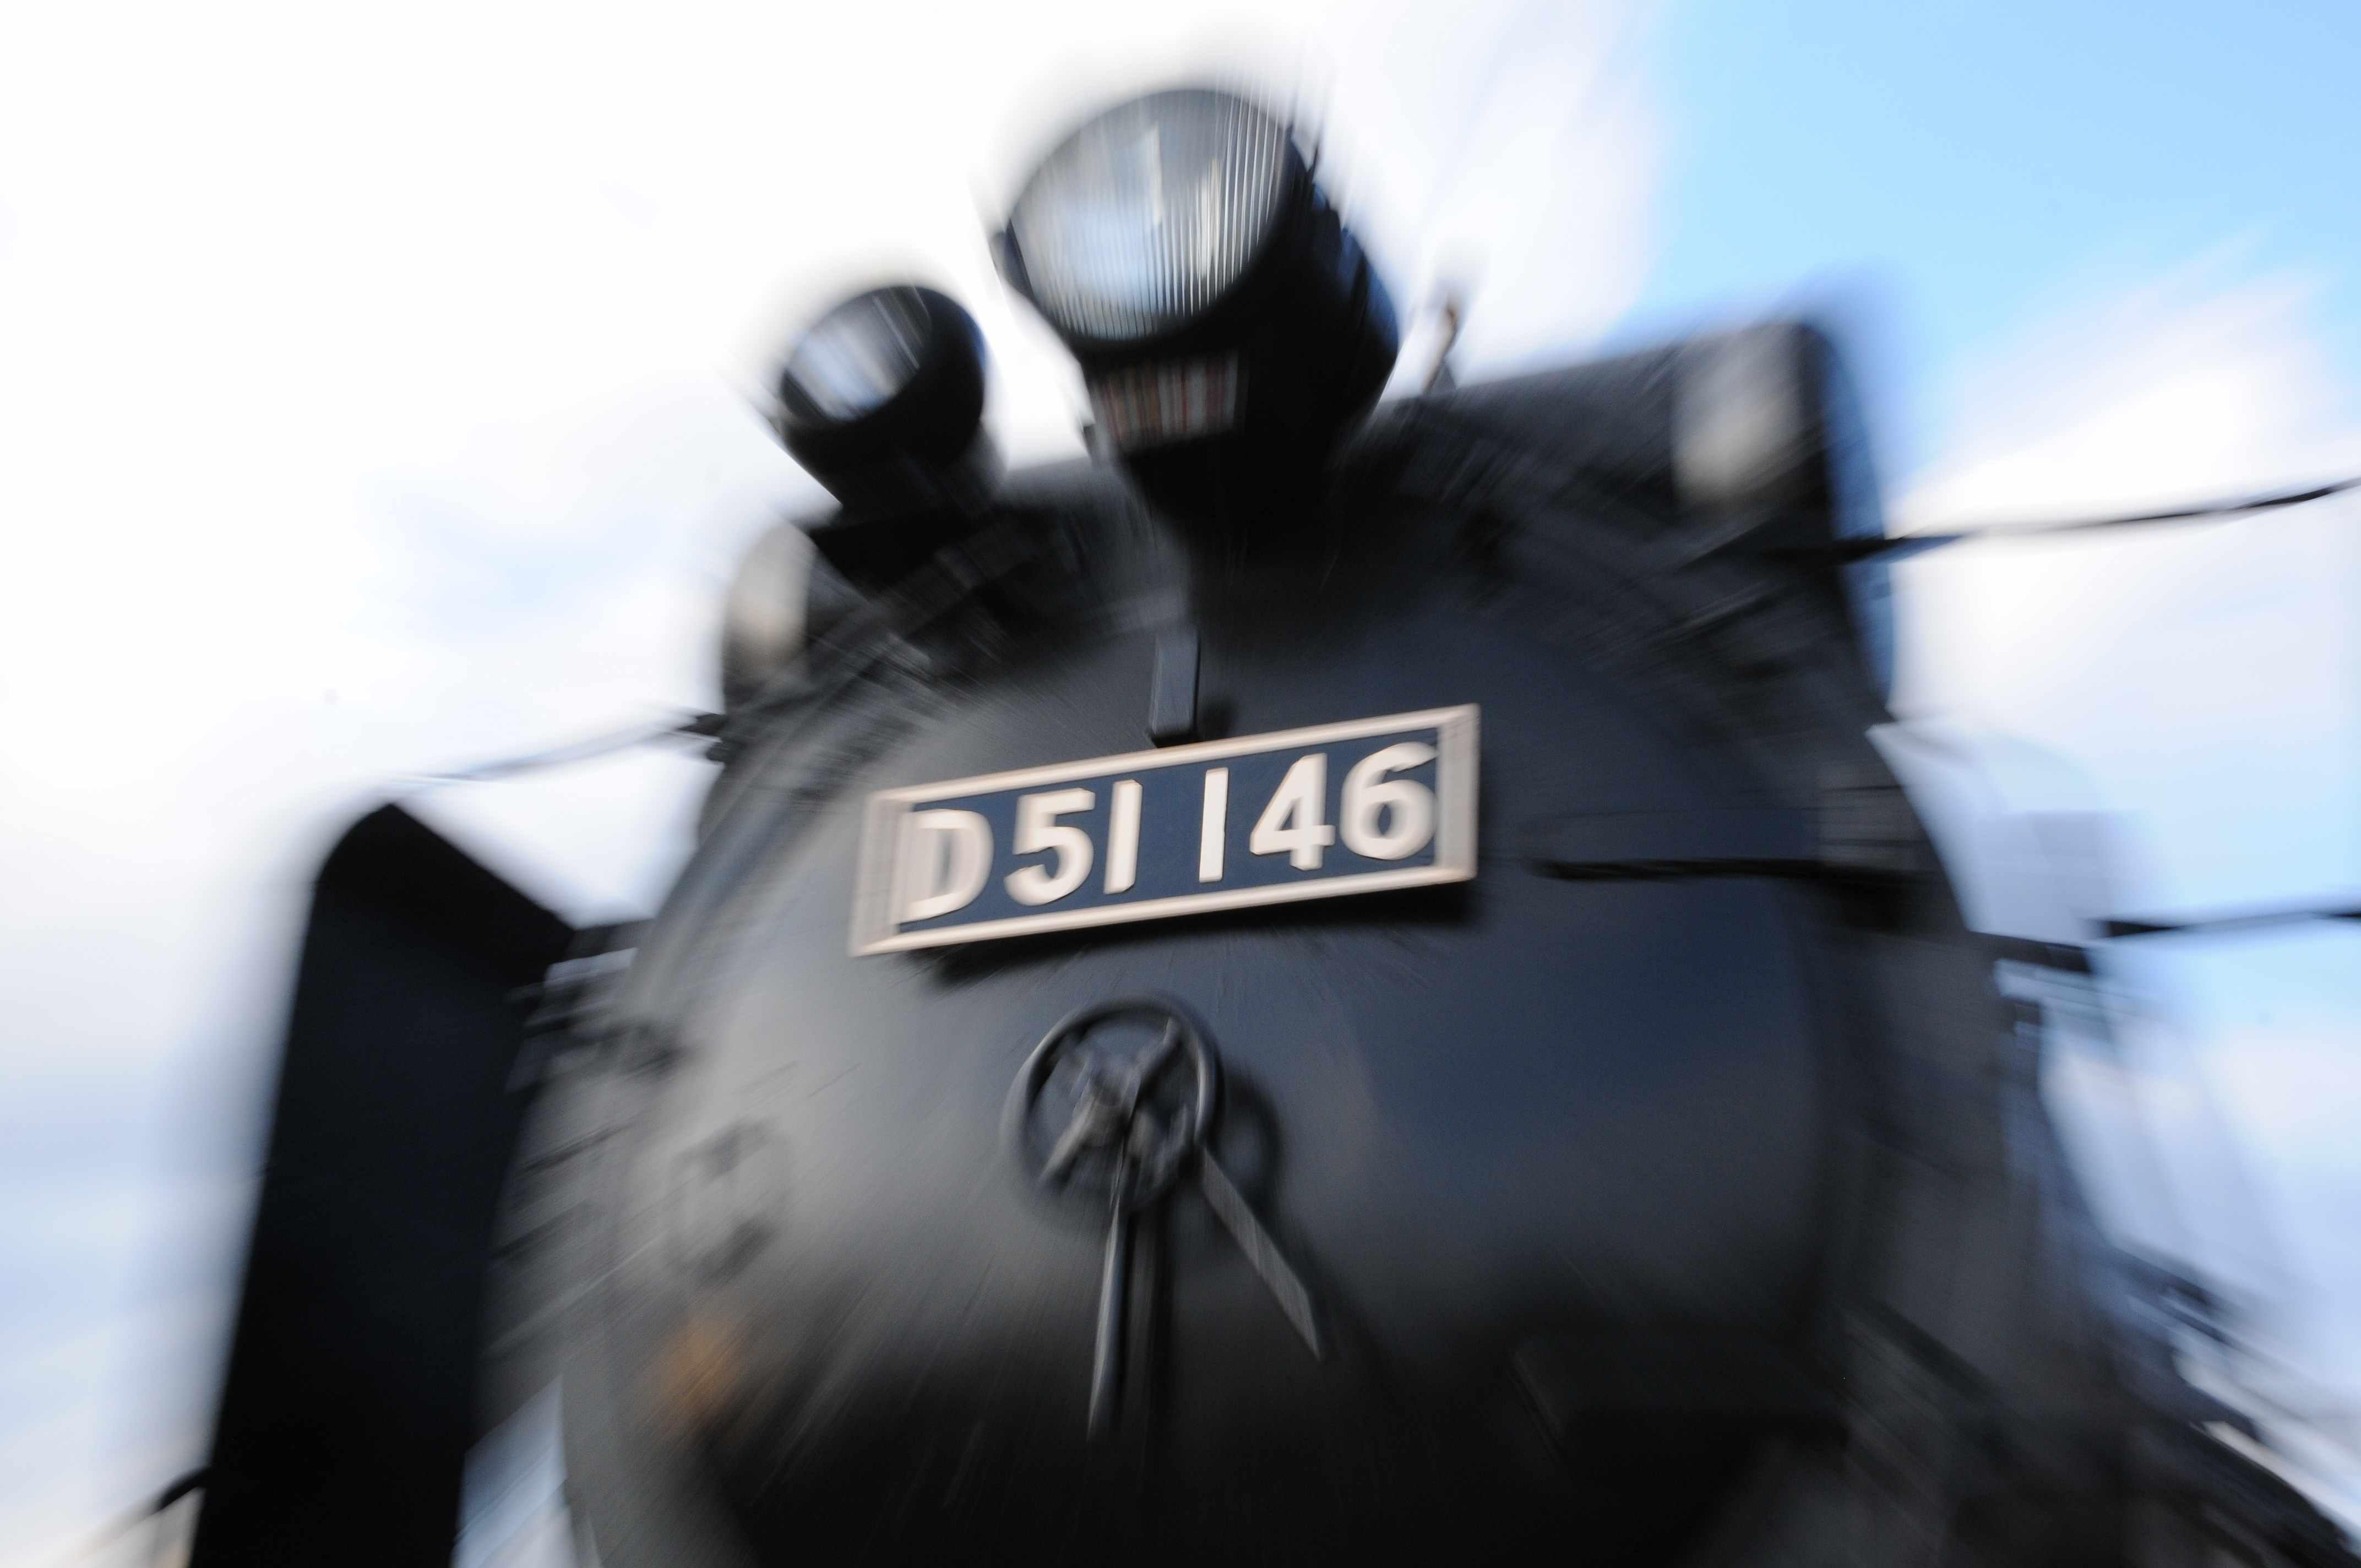 DSC_6653-1.jpg